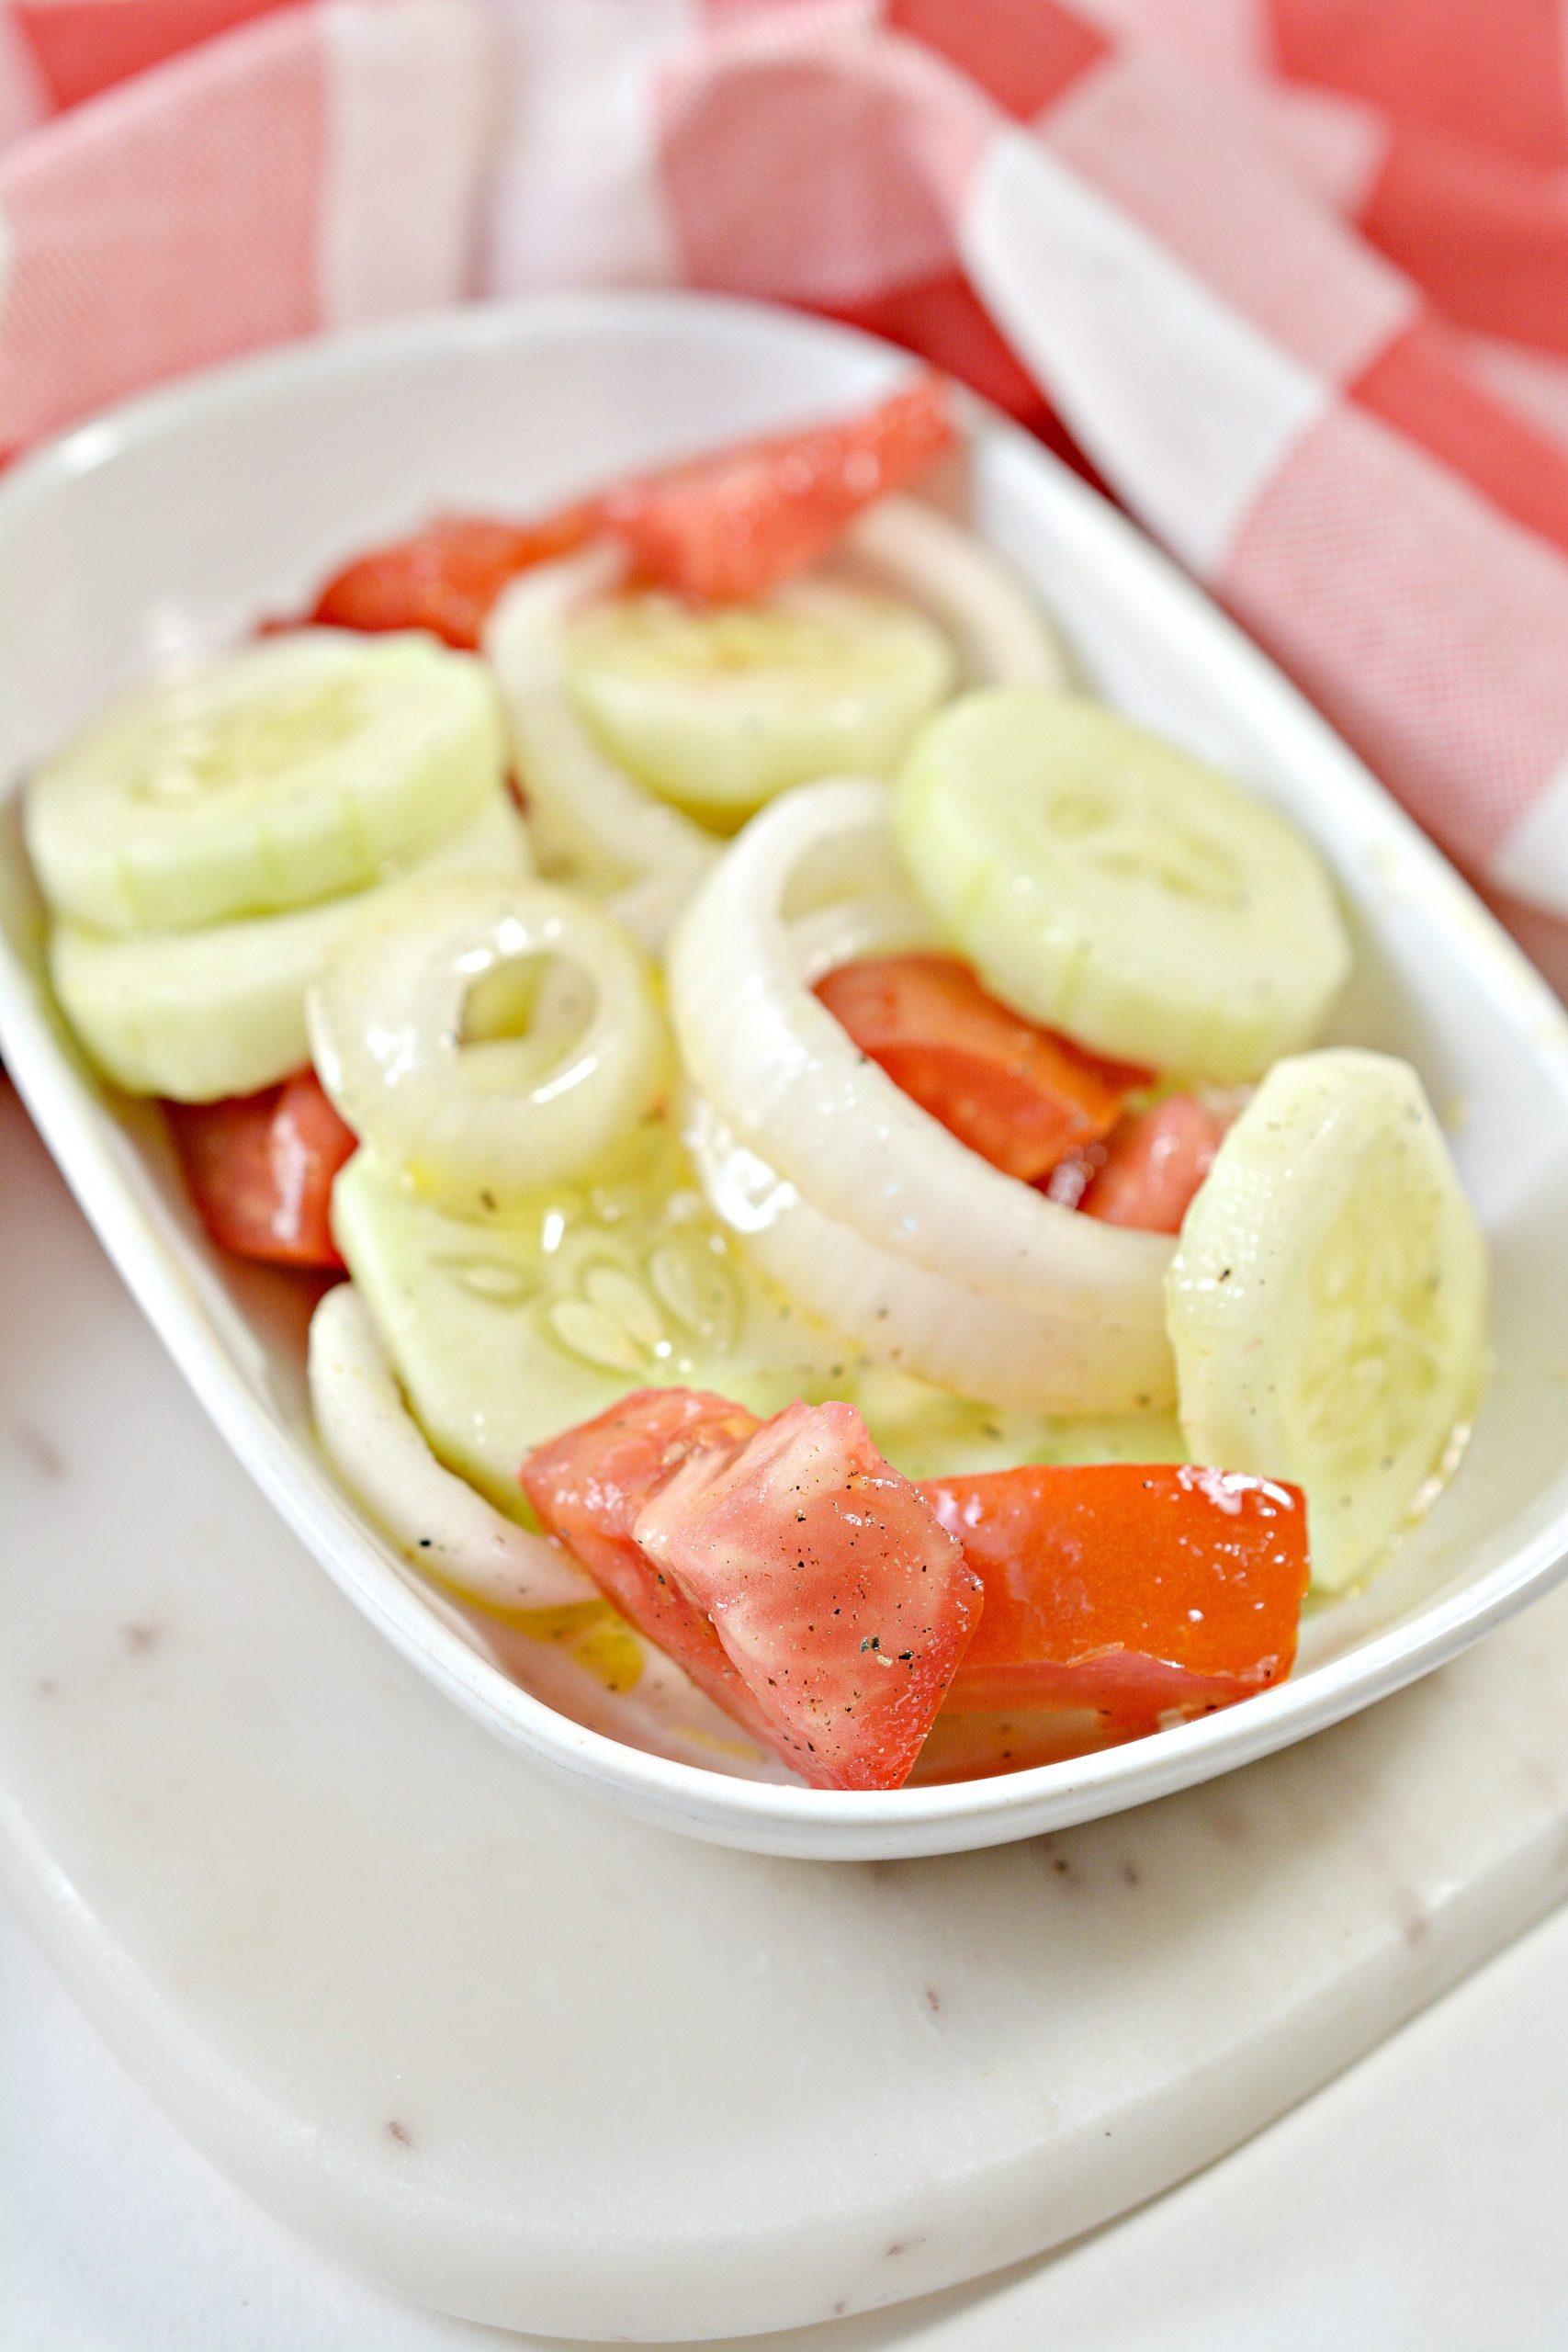 cucumber onion and tomato salad 2